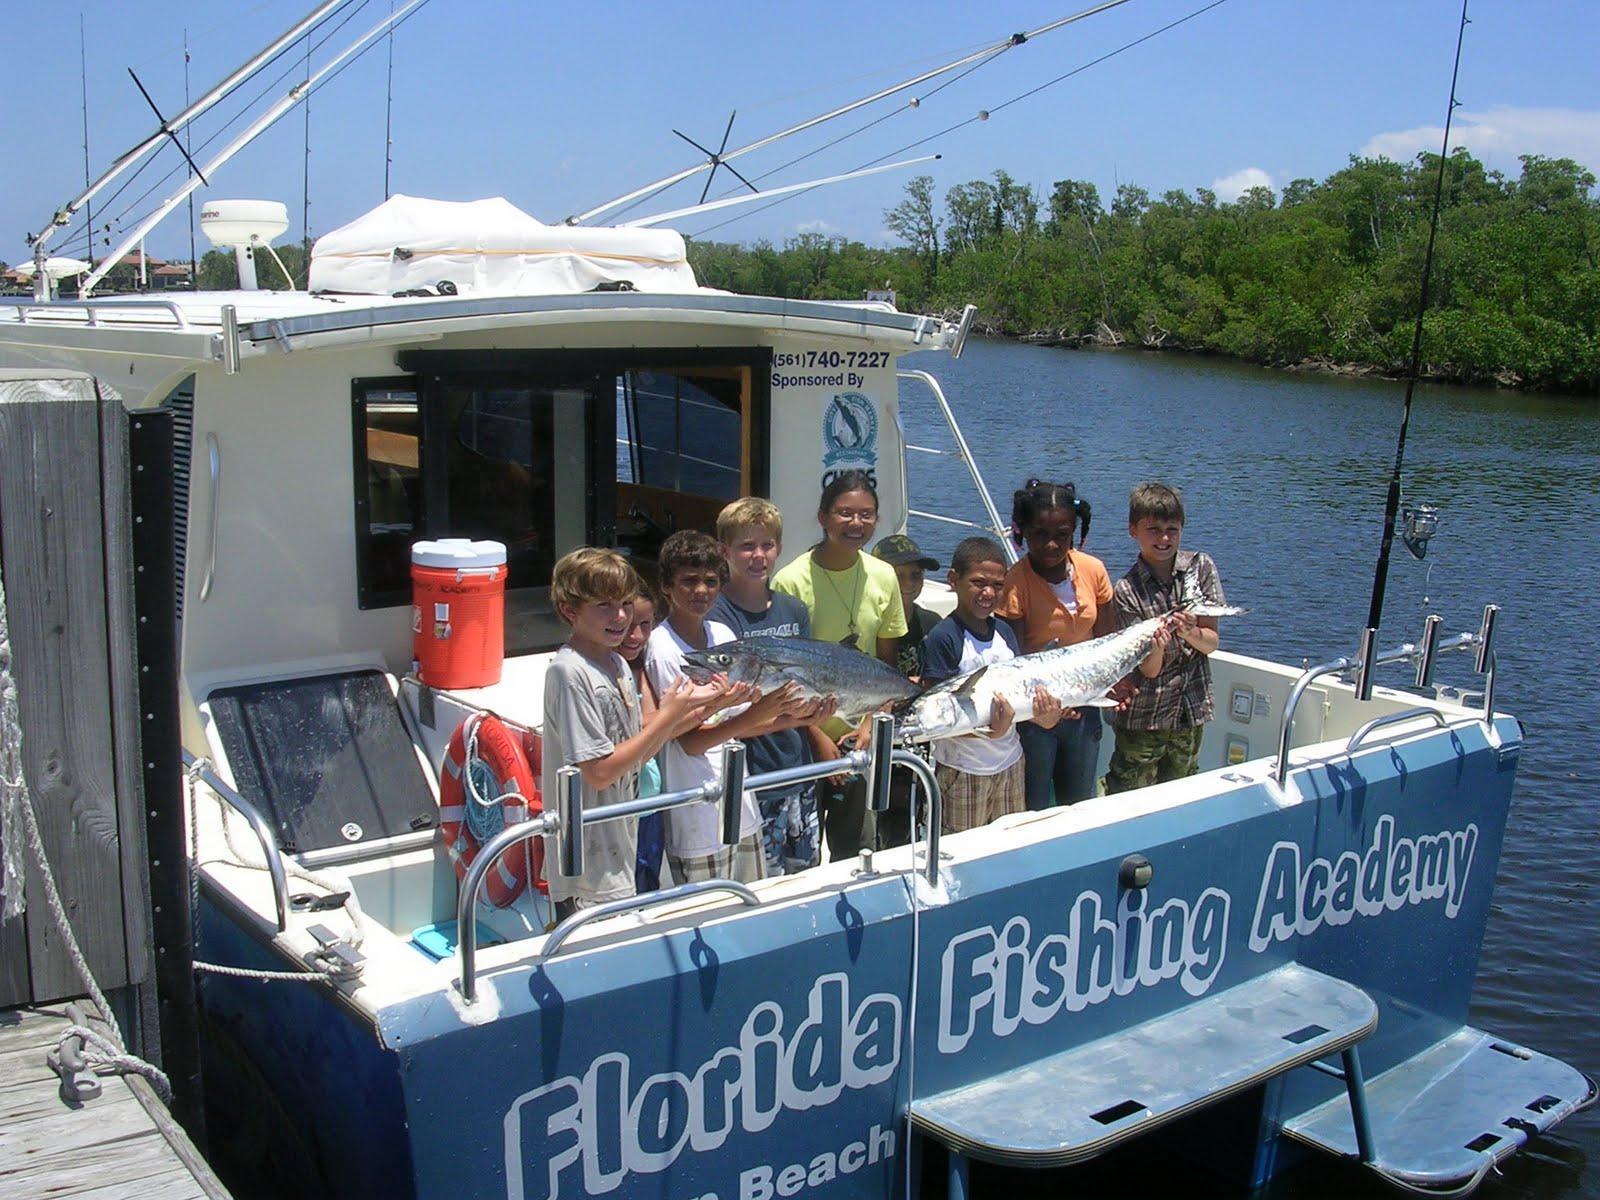 Florida fishing academy august 2010 for Boynton beach fishing